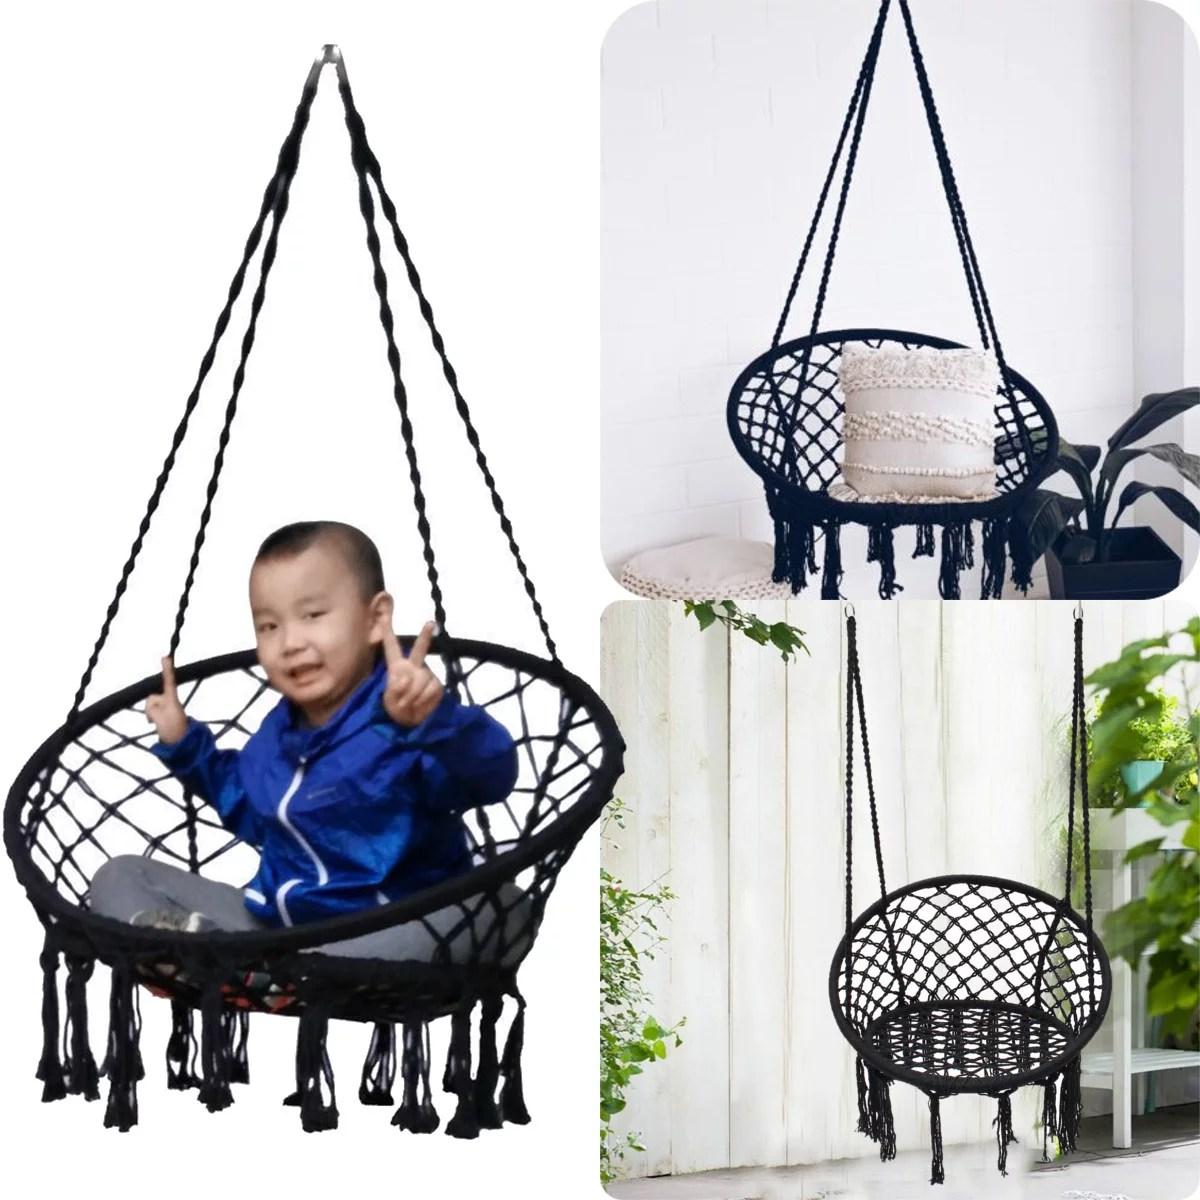 swing chair benefits wheelchair yoga classes black macrame hammock hanging woven cotton rope outdoor garden 120kg patio furniture walmart com